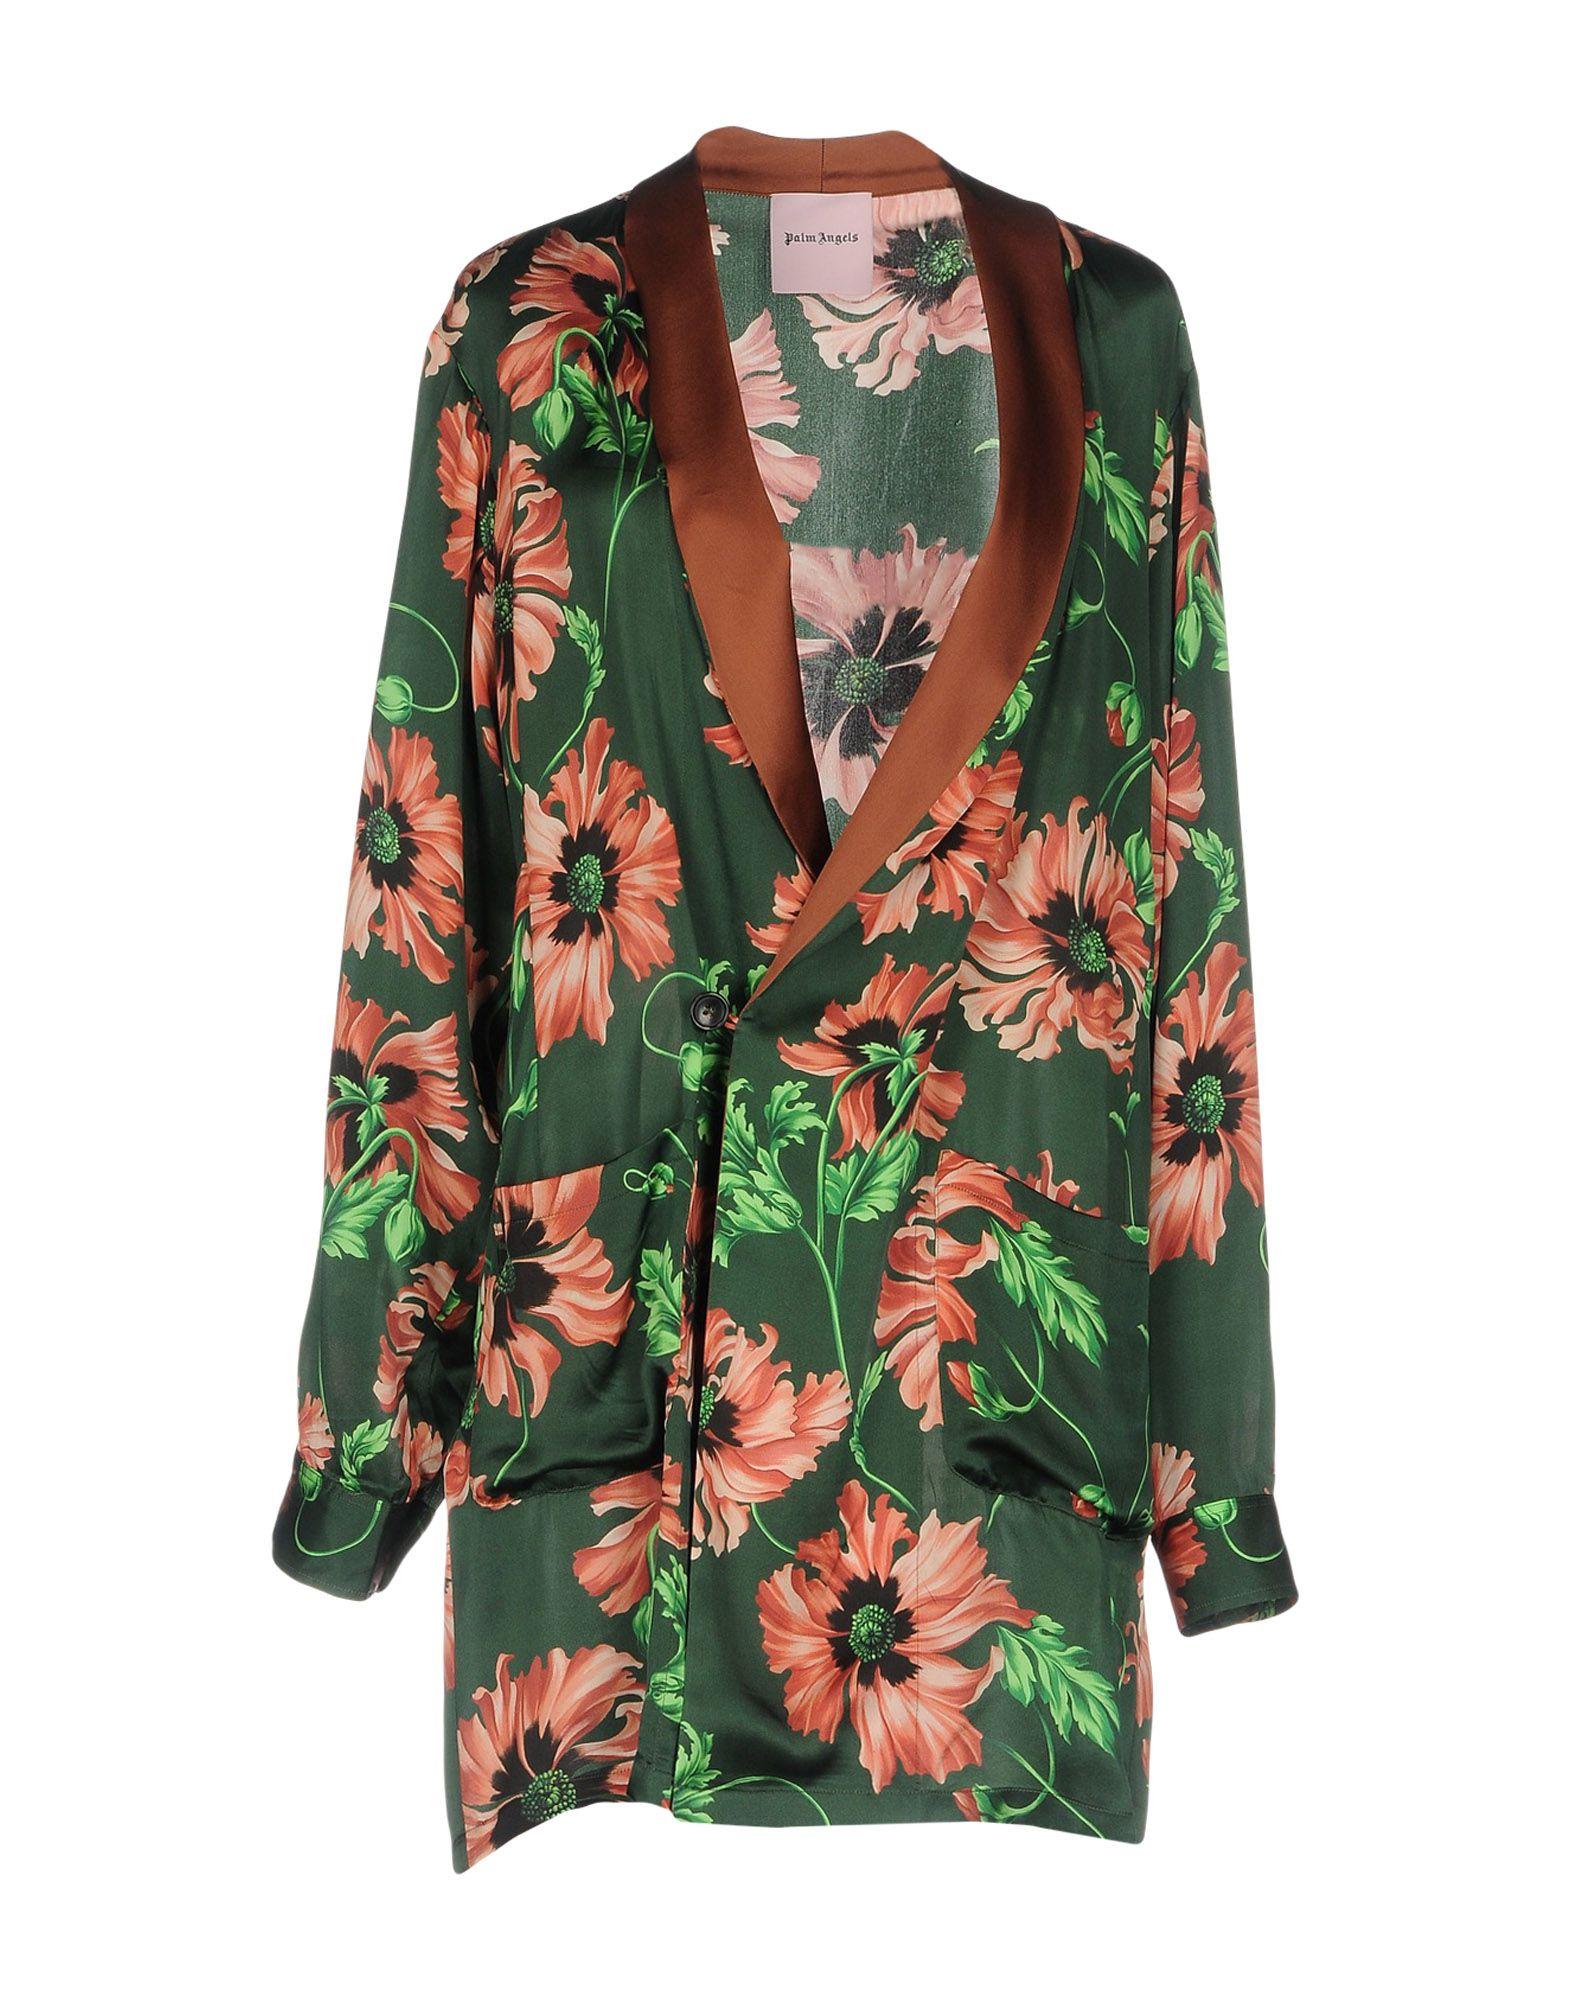 Giacca Palm Angels Donna - Acquista online su UWw7hd